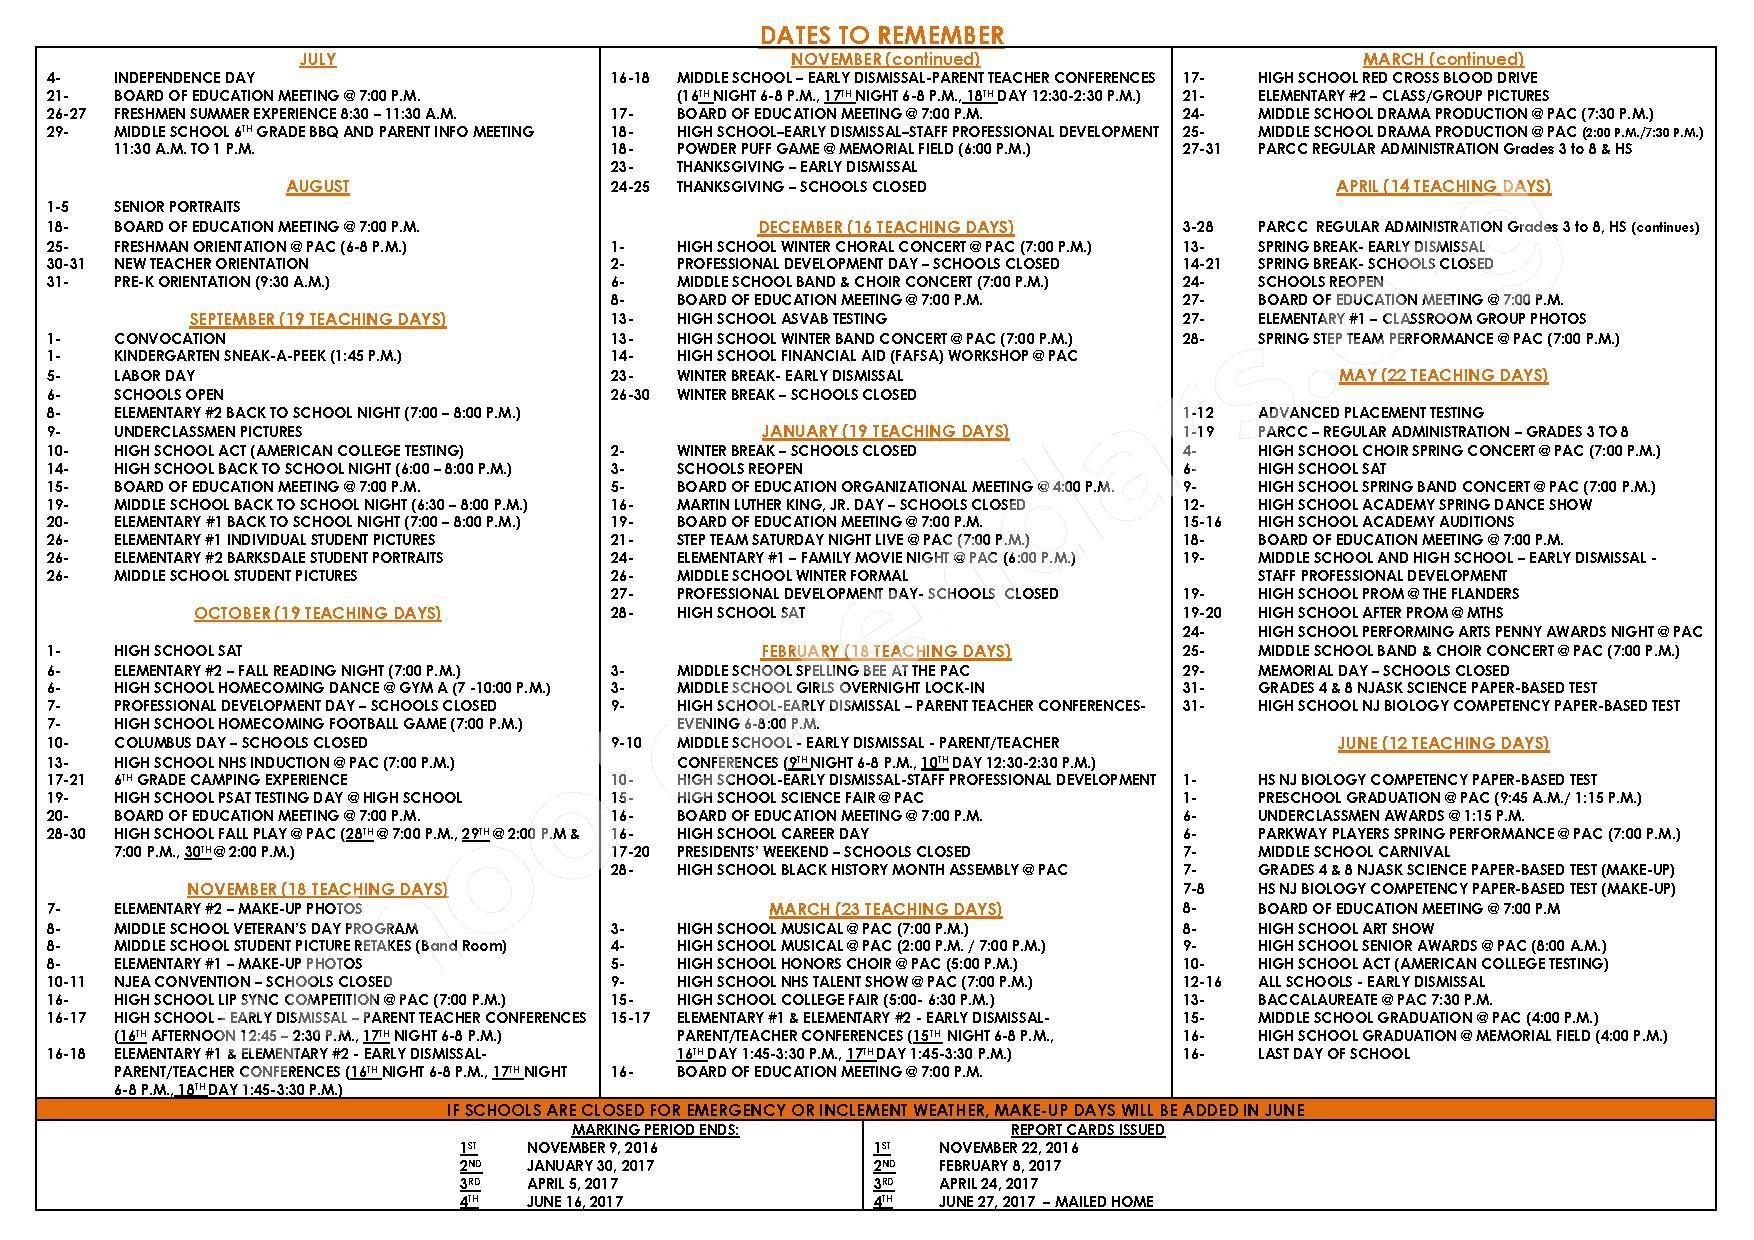 2016 - 2017 School Calendar – Middle Township Public Schools – page 2